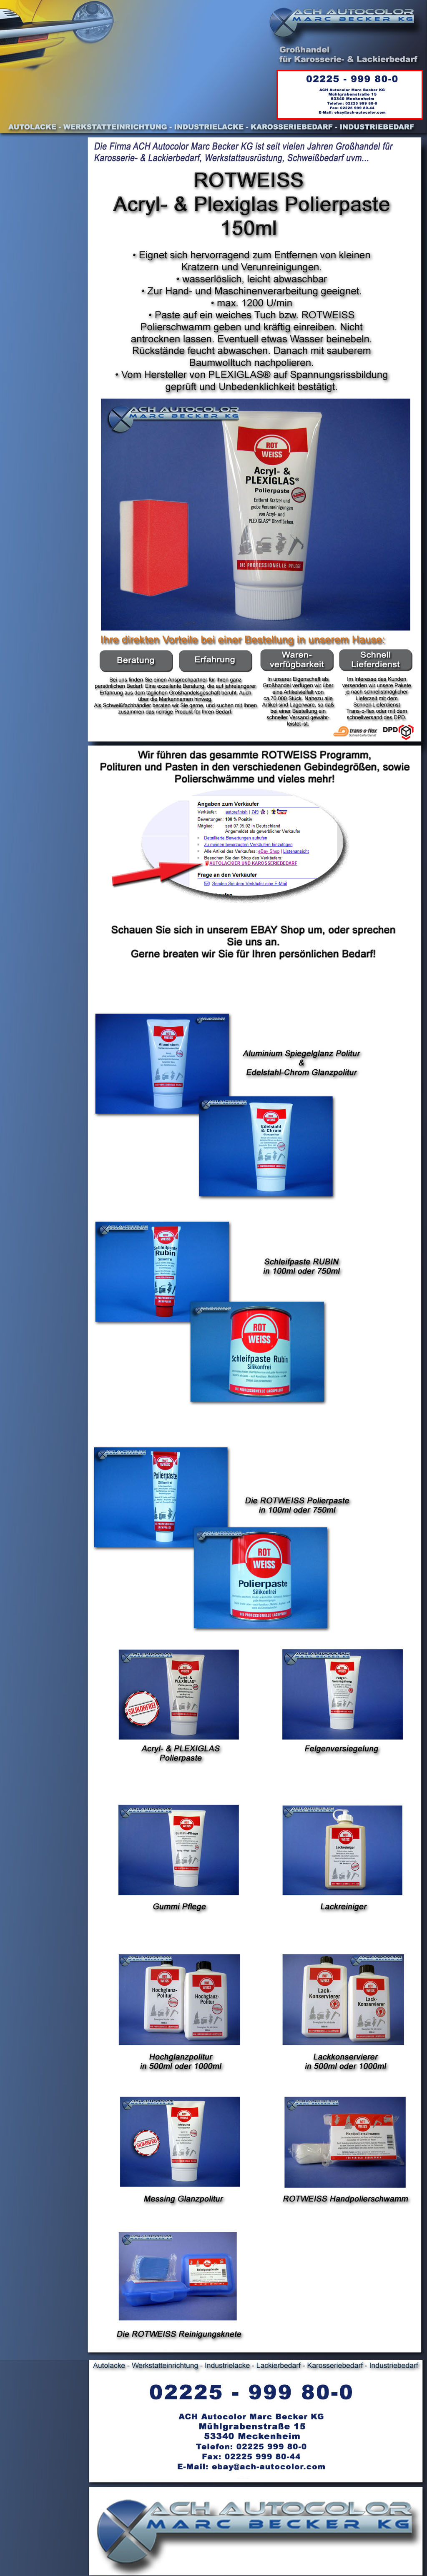 rotweiss acryl plexiglas polierpaste 150ml autolack. Black Bedroom Furniture Sets. Home Design Ideas